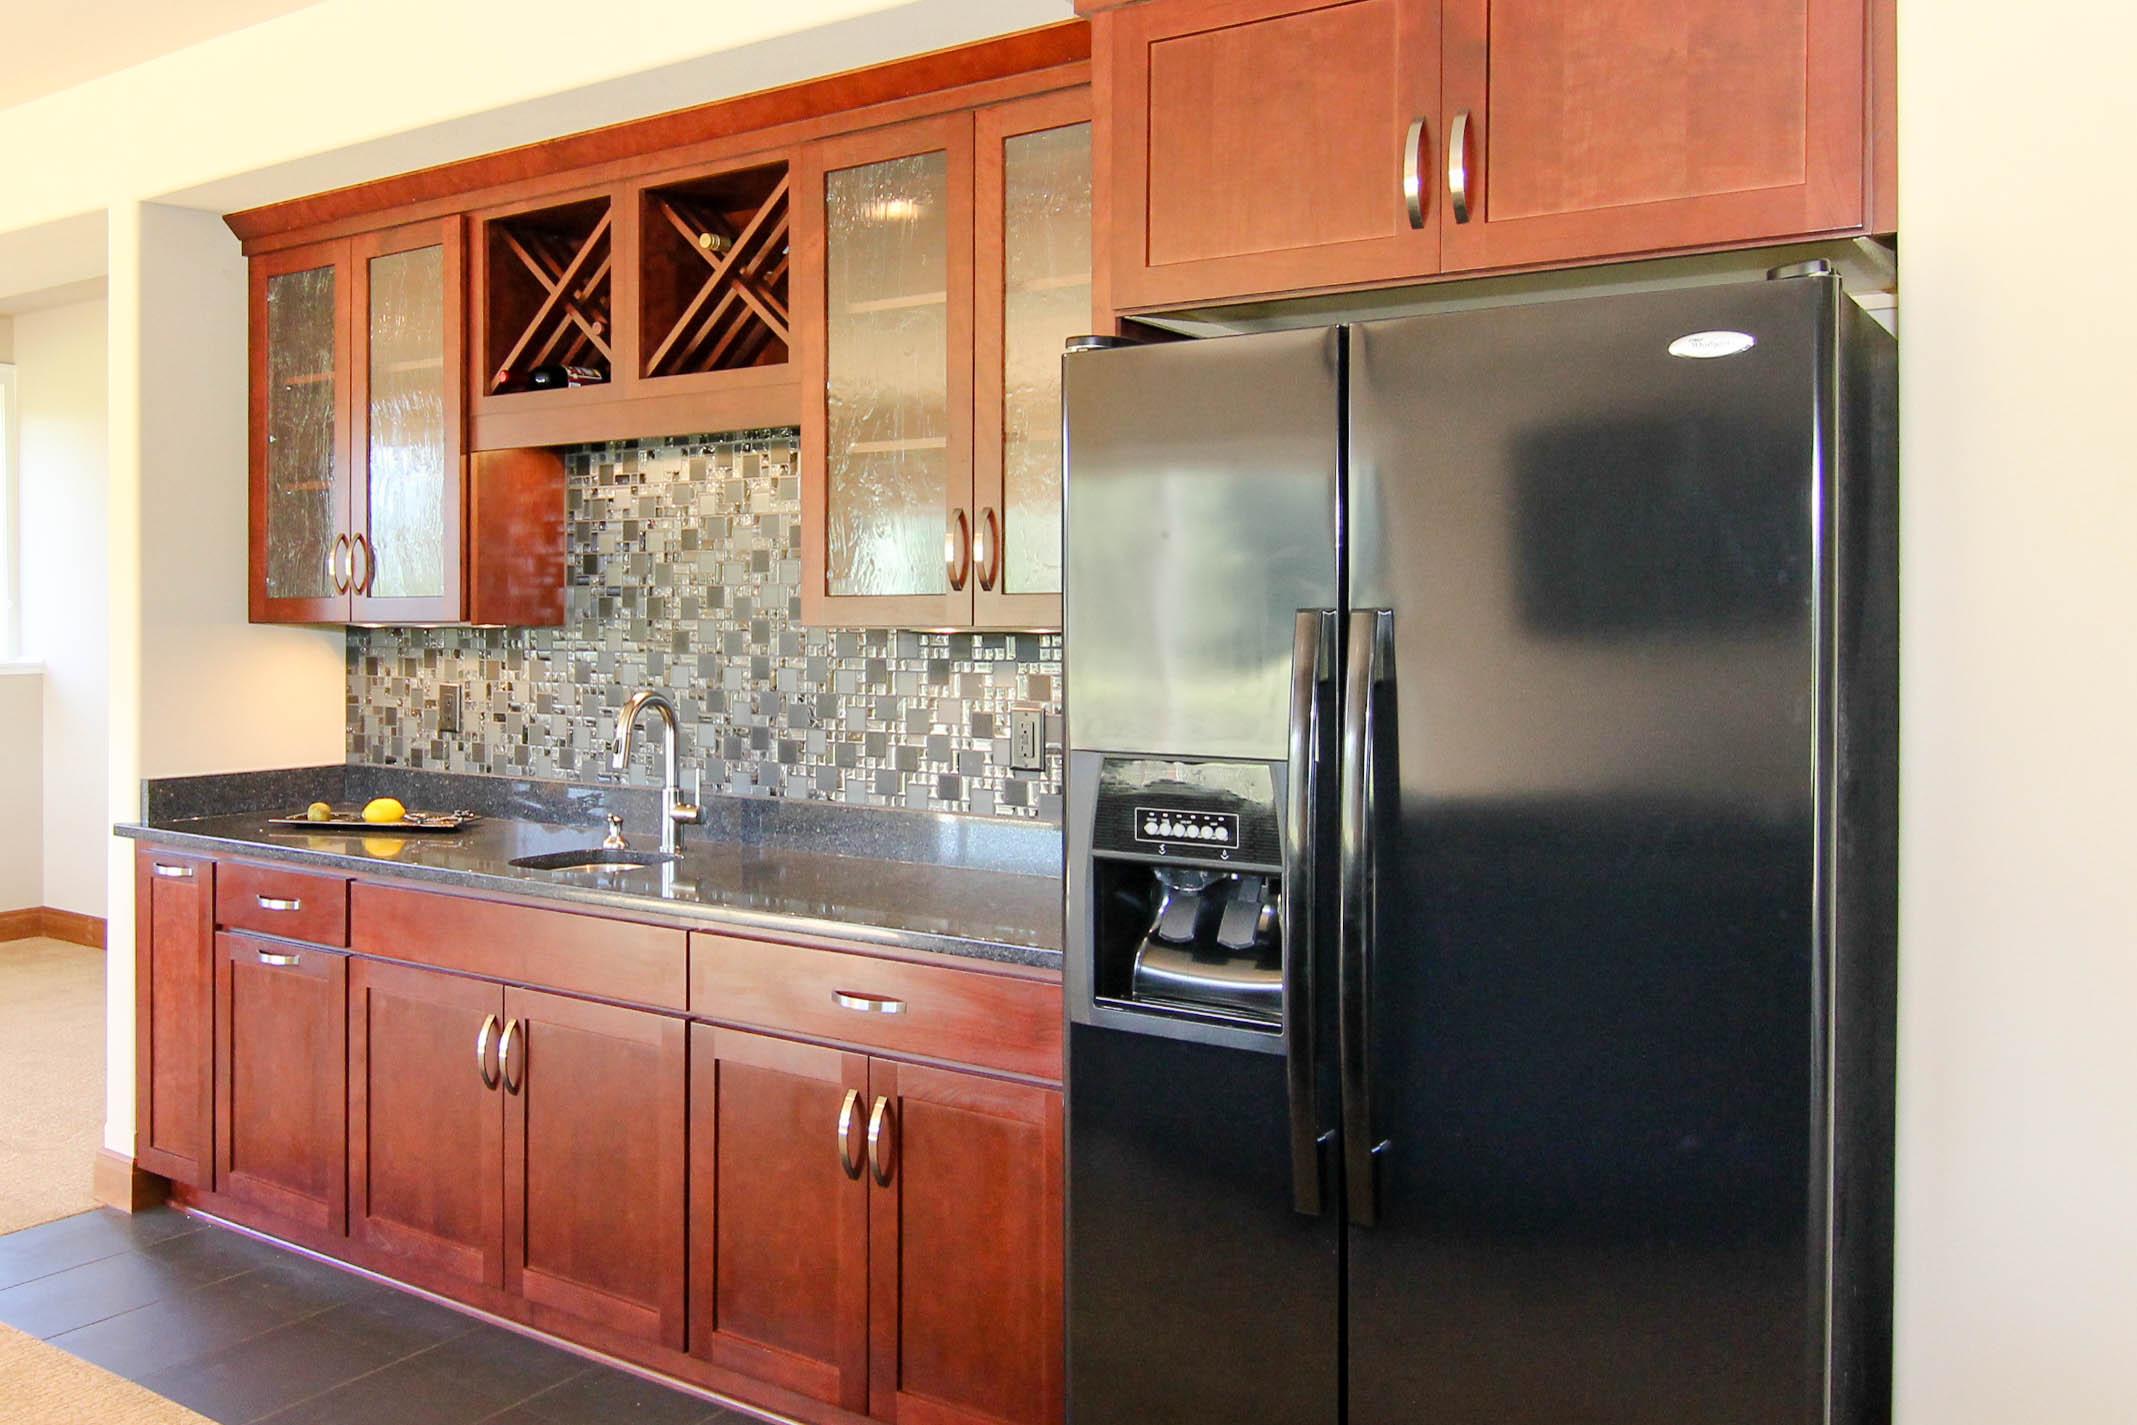 Finished Basement Kitchen Area